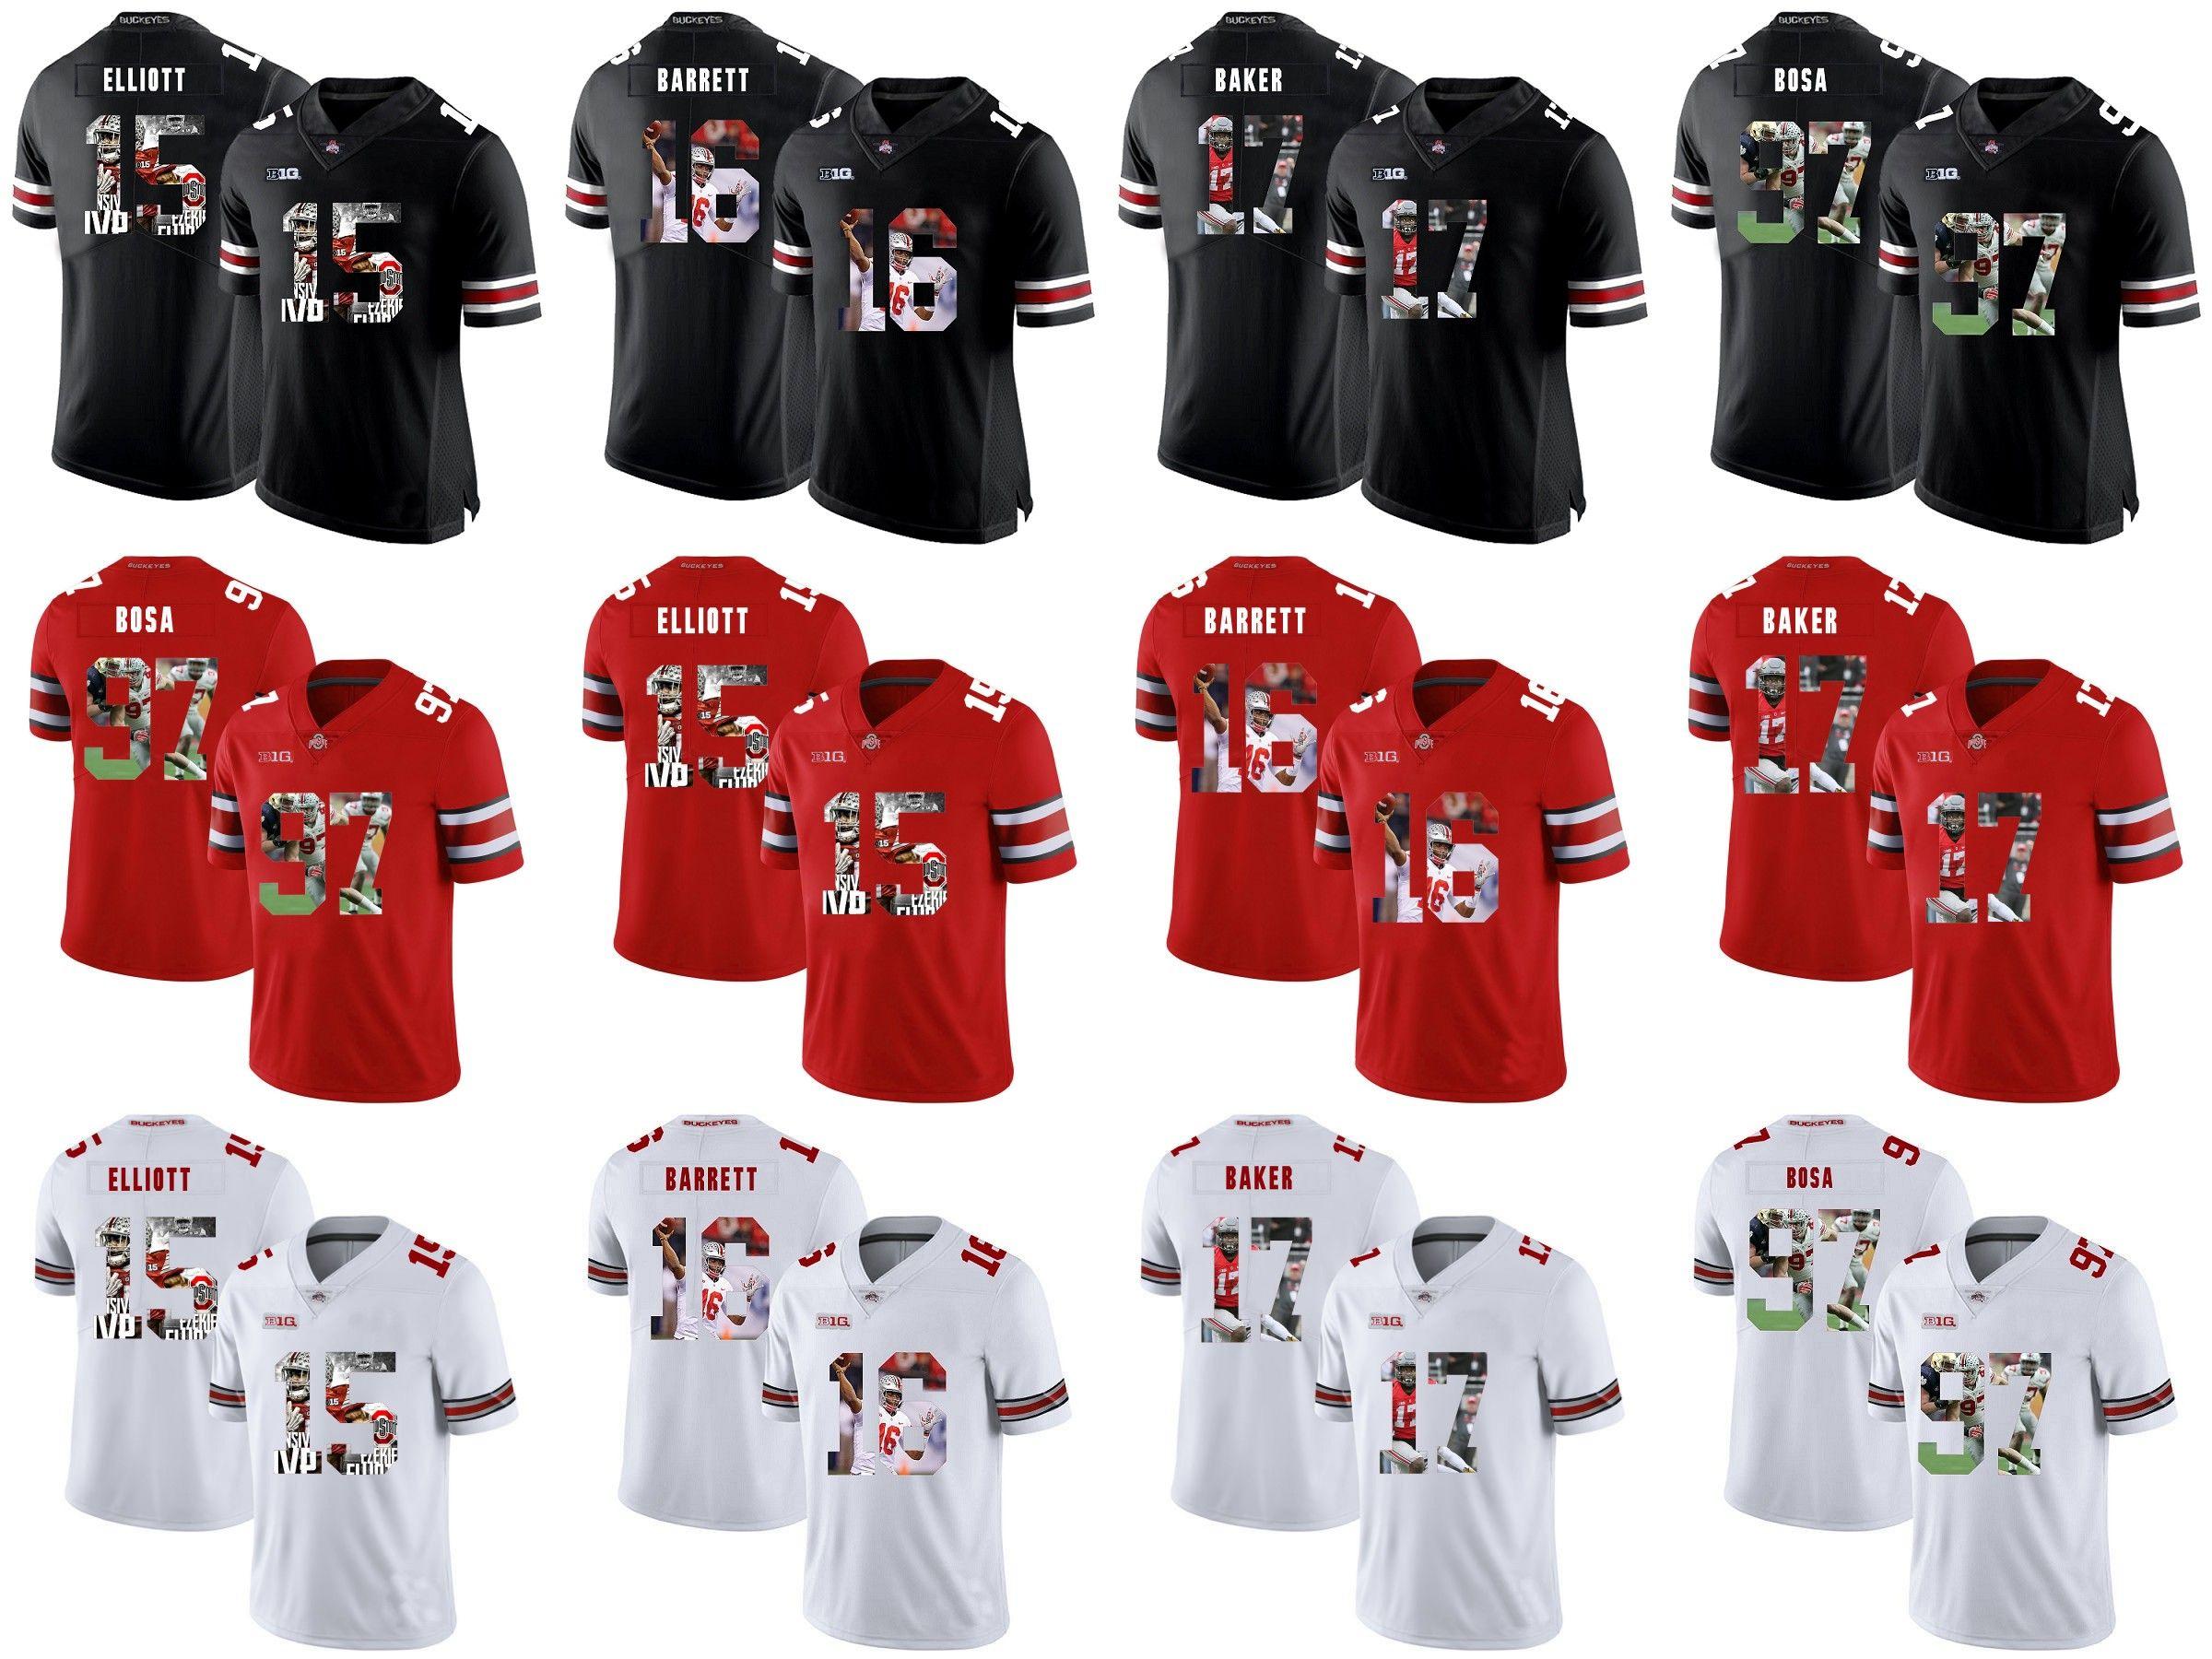 buy popular 9462f 91bfe Ohio State Buckeyes # Ezekiel Elliott J.T. Barrett Jerome Baker Joey Bosa  College Football Stitched Jerseys White Black Red